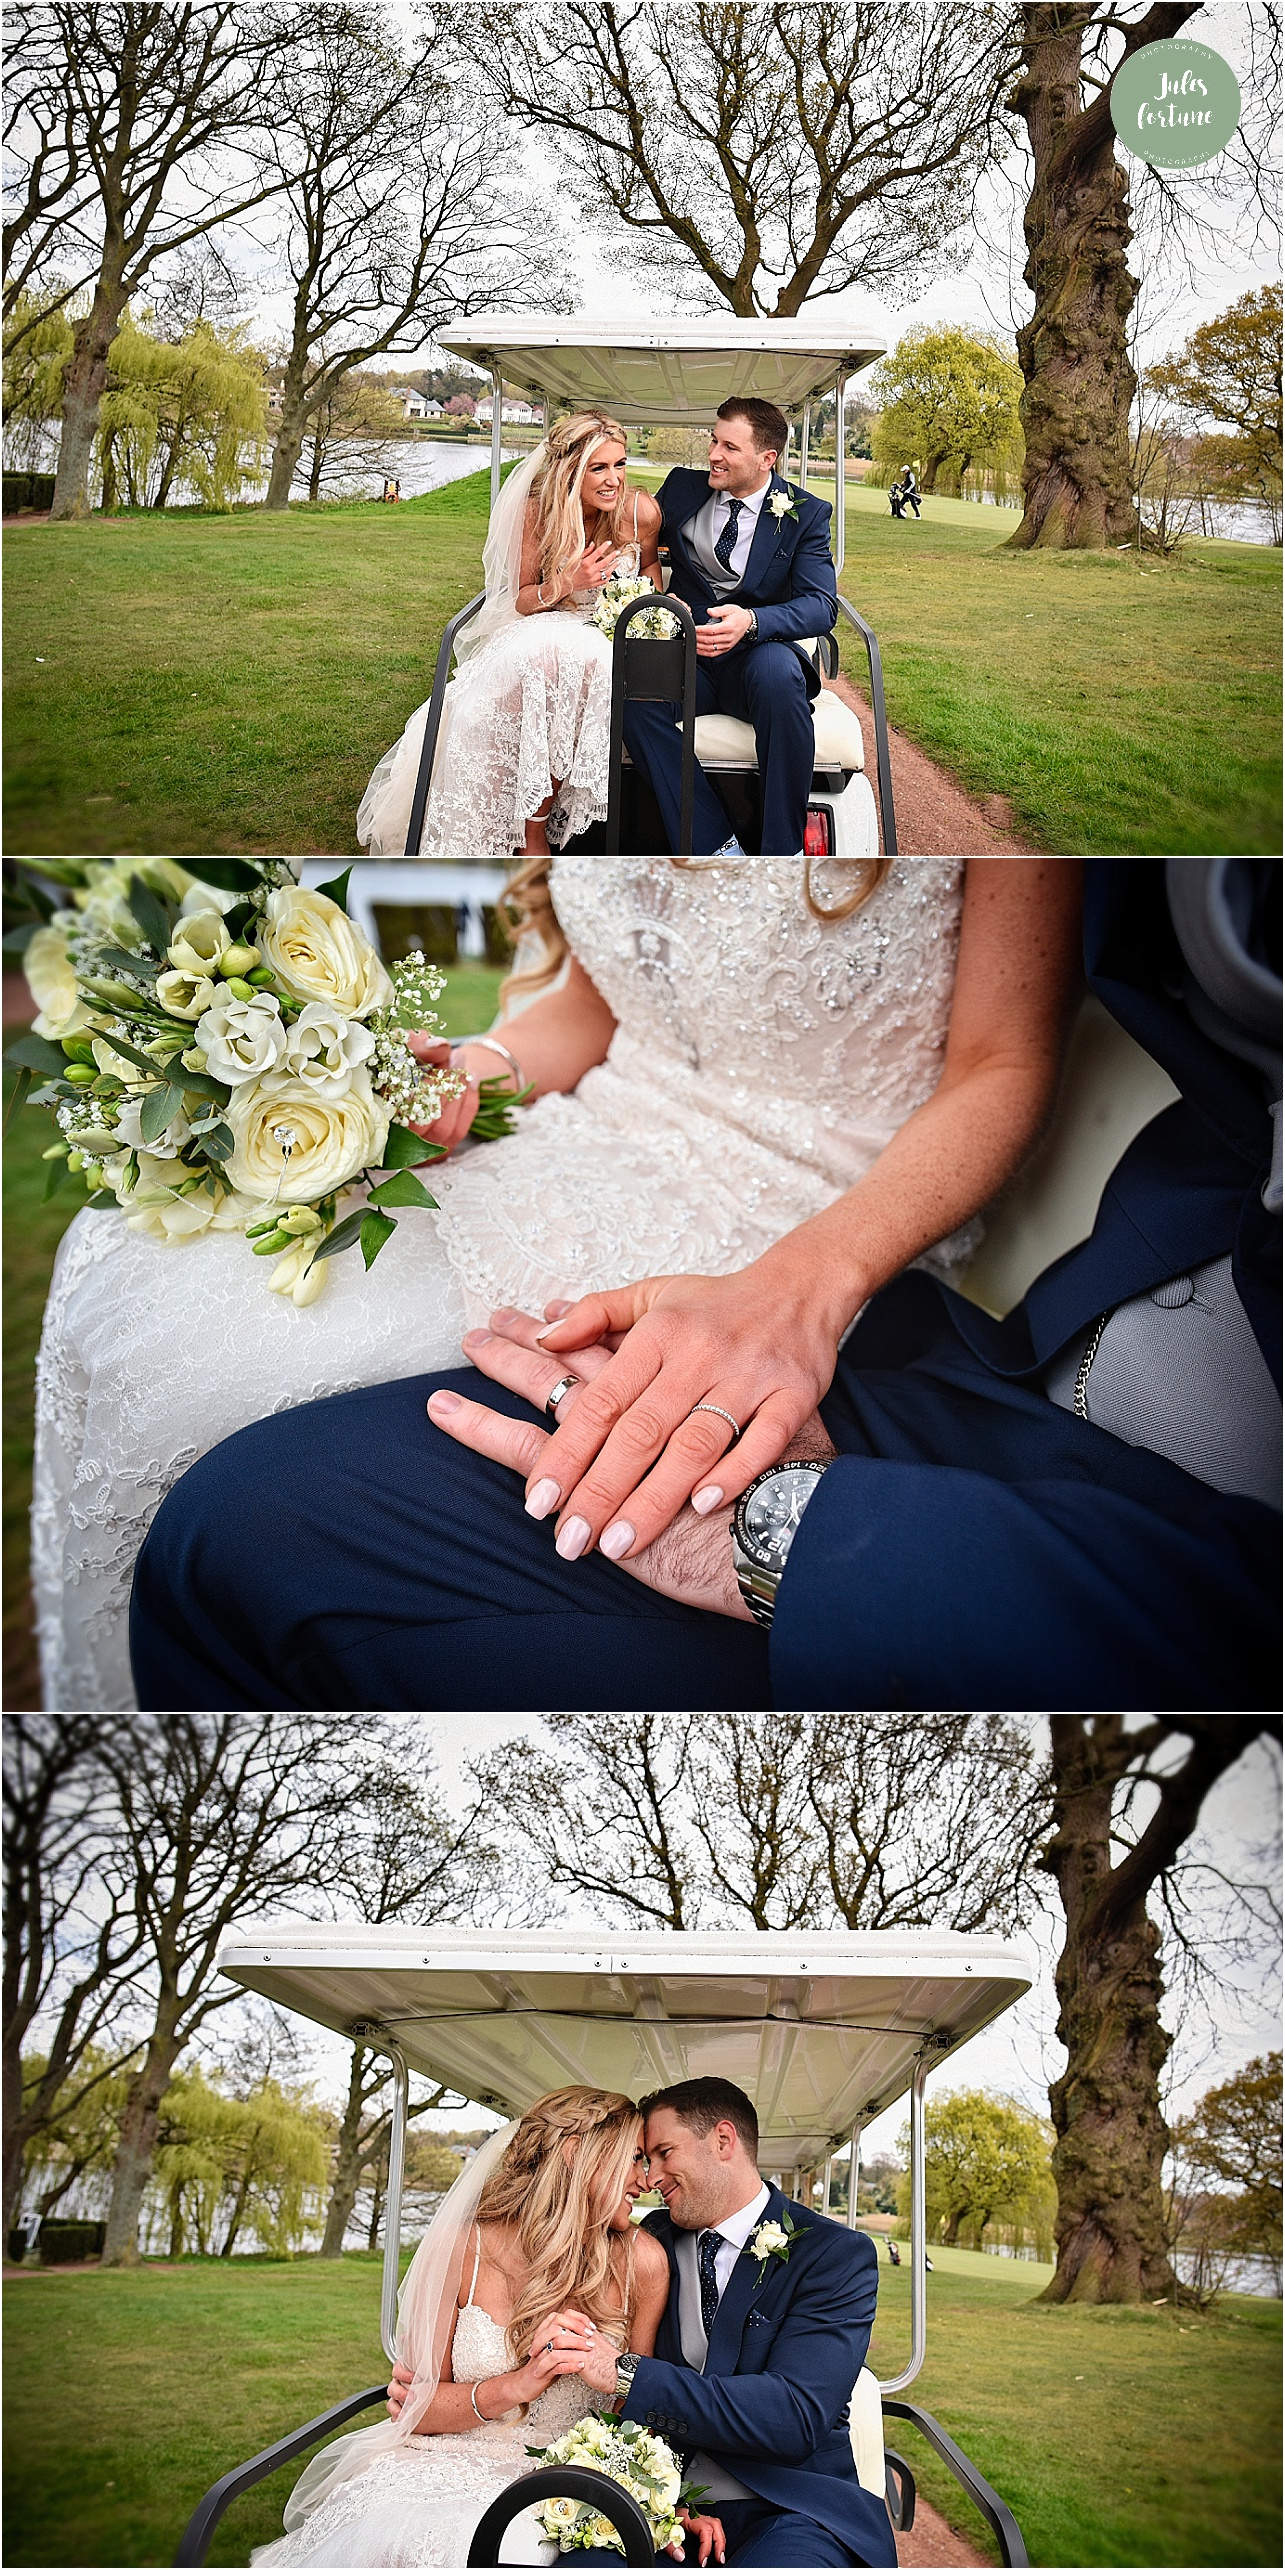 The Mere Wedding Venue Cheshire